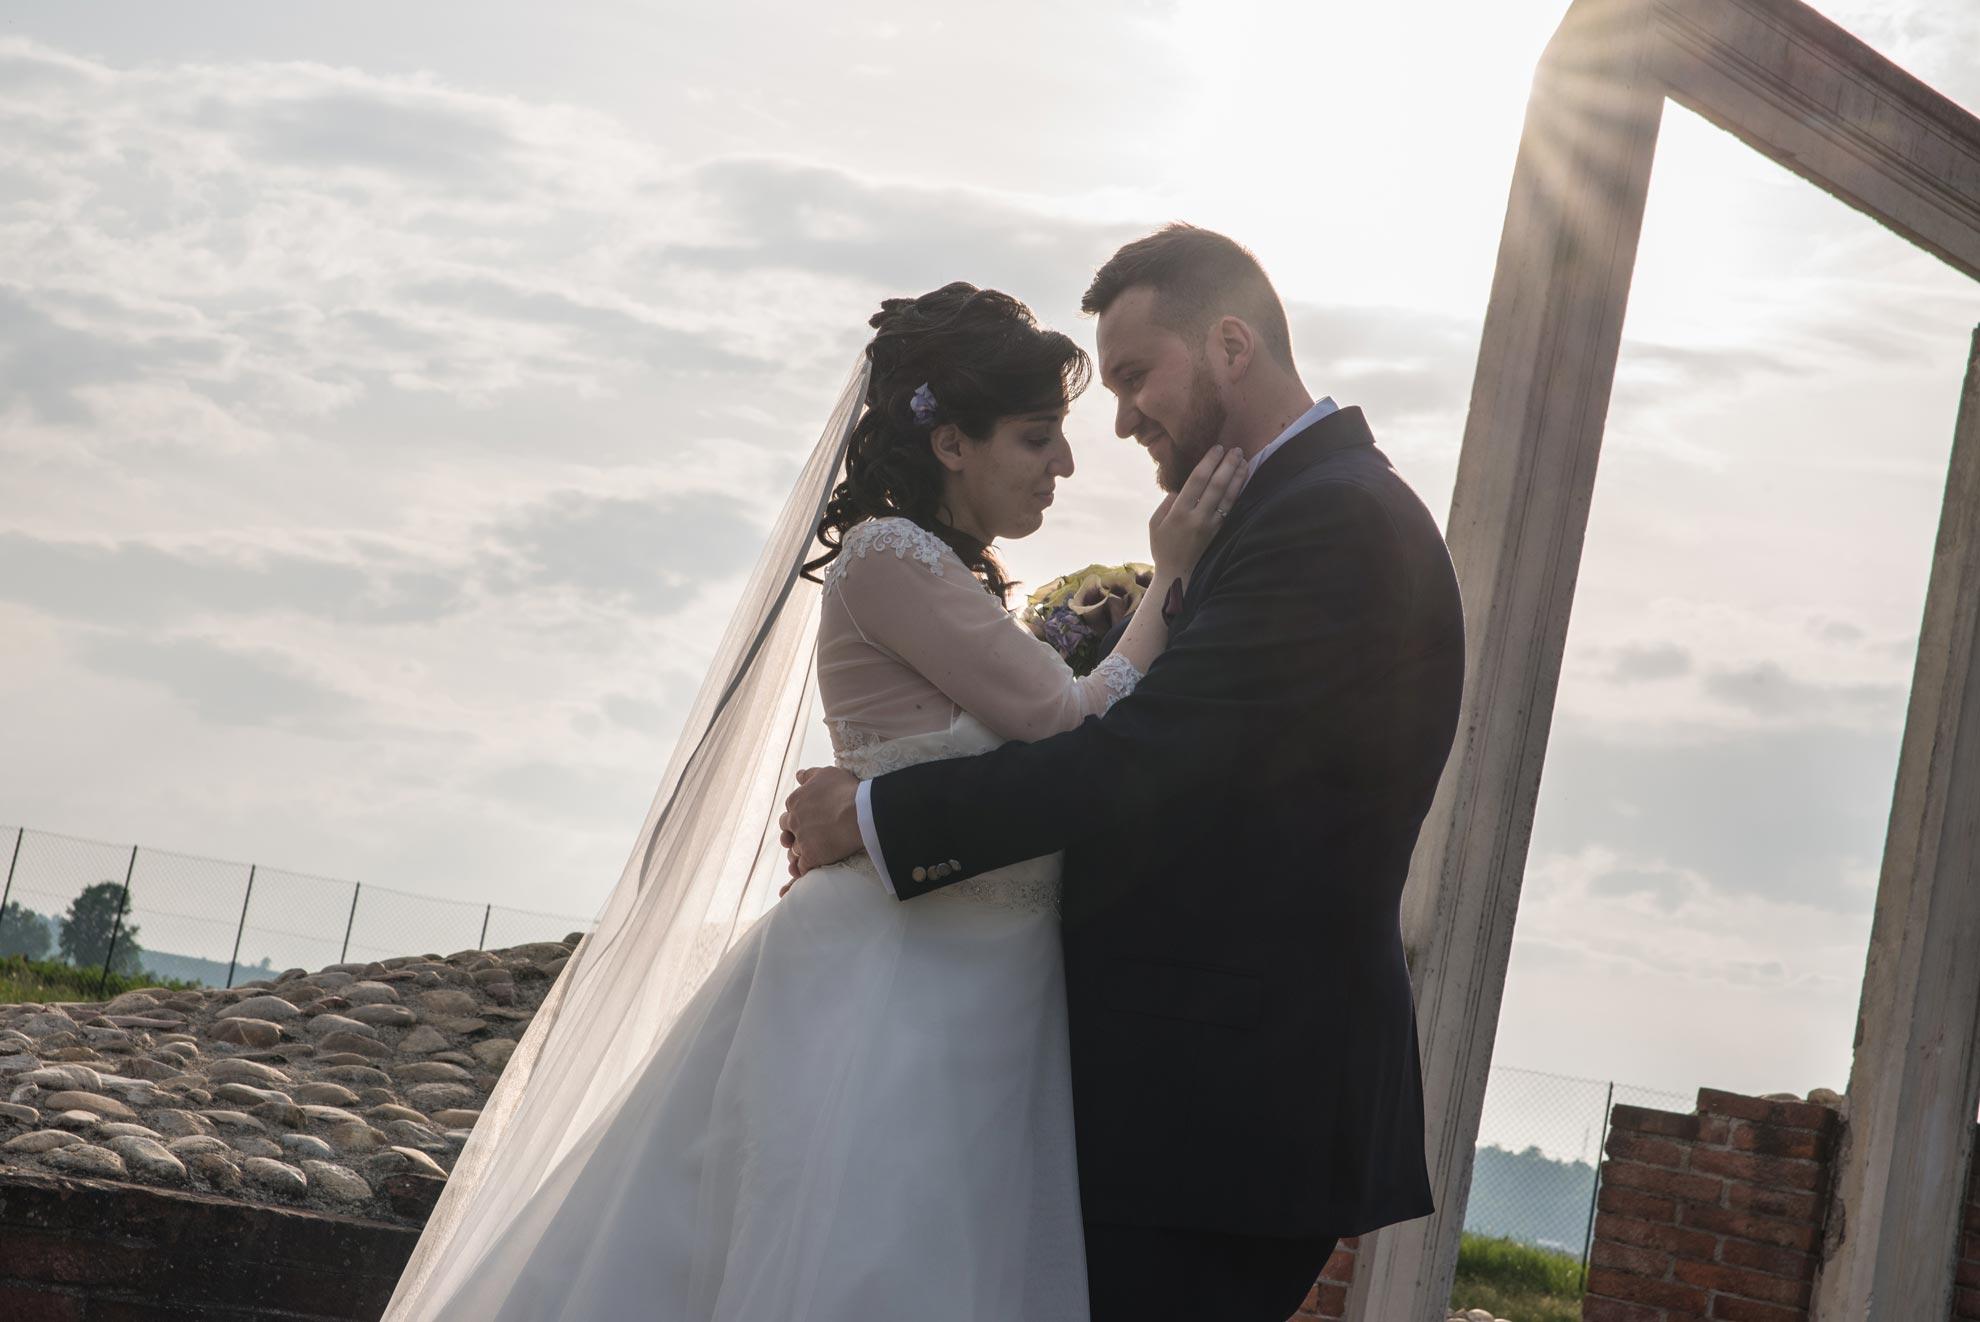 Matrimonio a Narzole Lorenza Diego - DSC 3227 - Fotografie matrimonio al tramonto - Fotografie matrimonio al tramonto